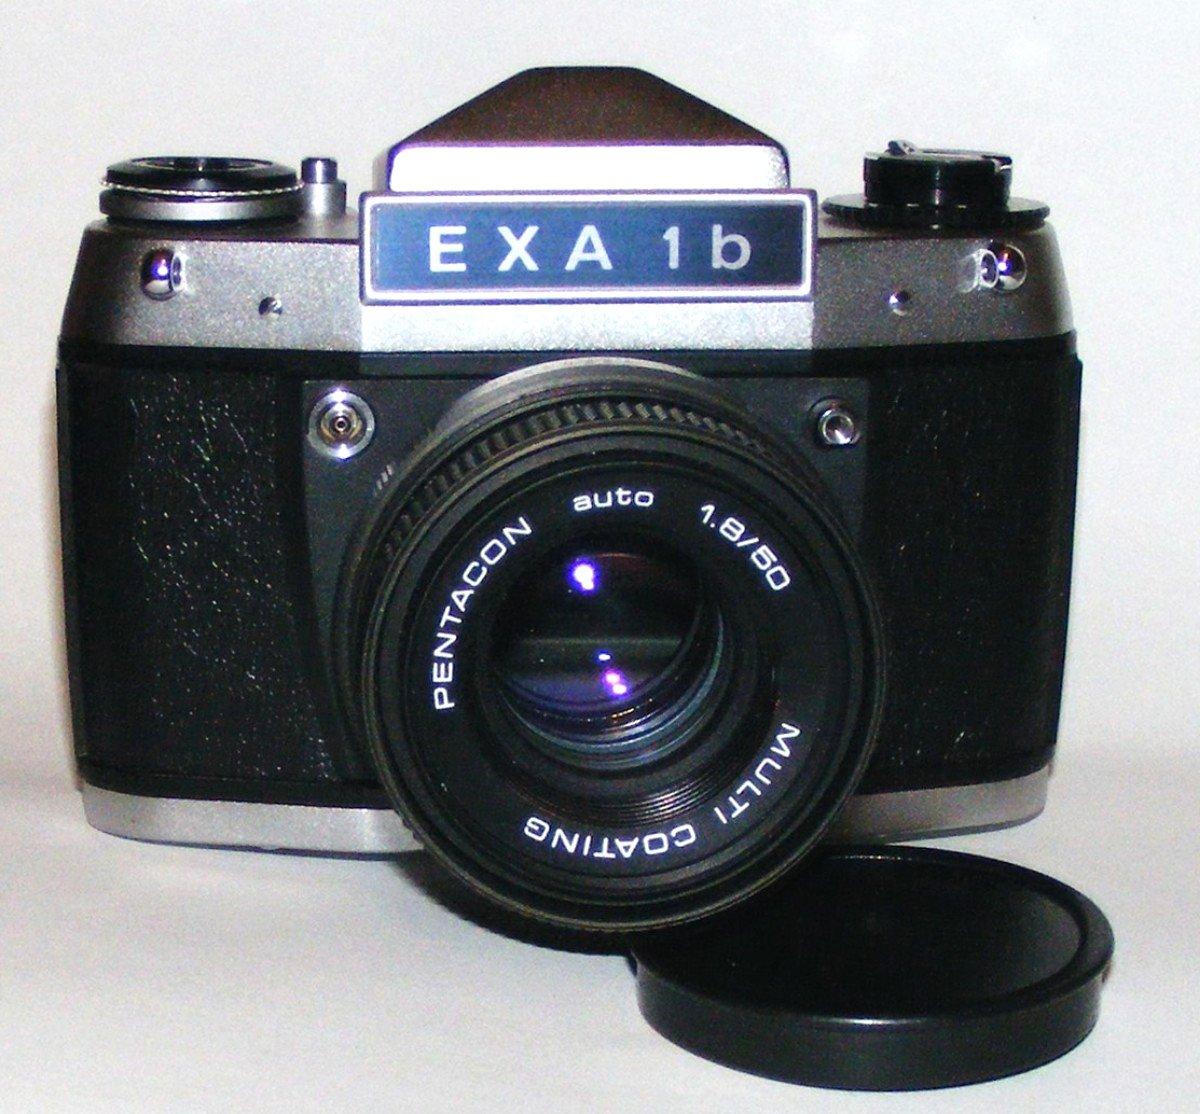 Sehr schöne funktionale DDR Spiegelreflex Exa1b aus den Achtzigern: #exa1b #exa #analogfotografie #analogphotography #swfilm #foma #swfotografie #photo #photoart #eastgermany #pentacondresdenpic.twitter.com/nMSesFvF4U